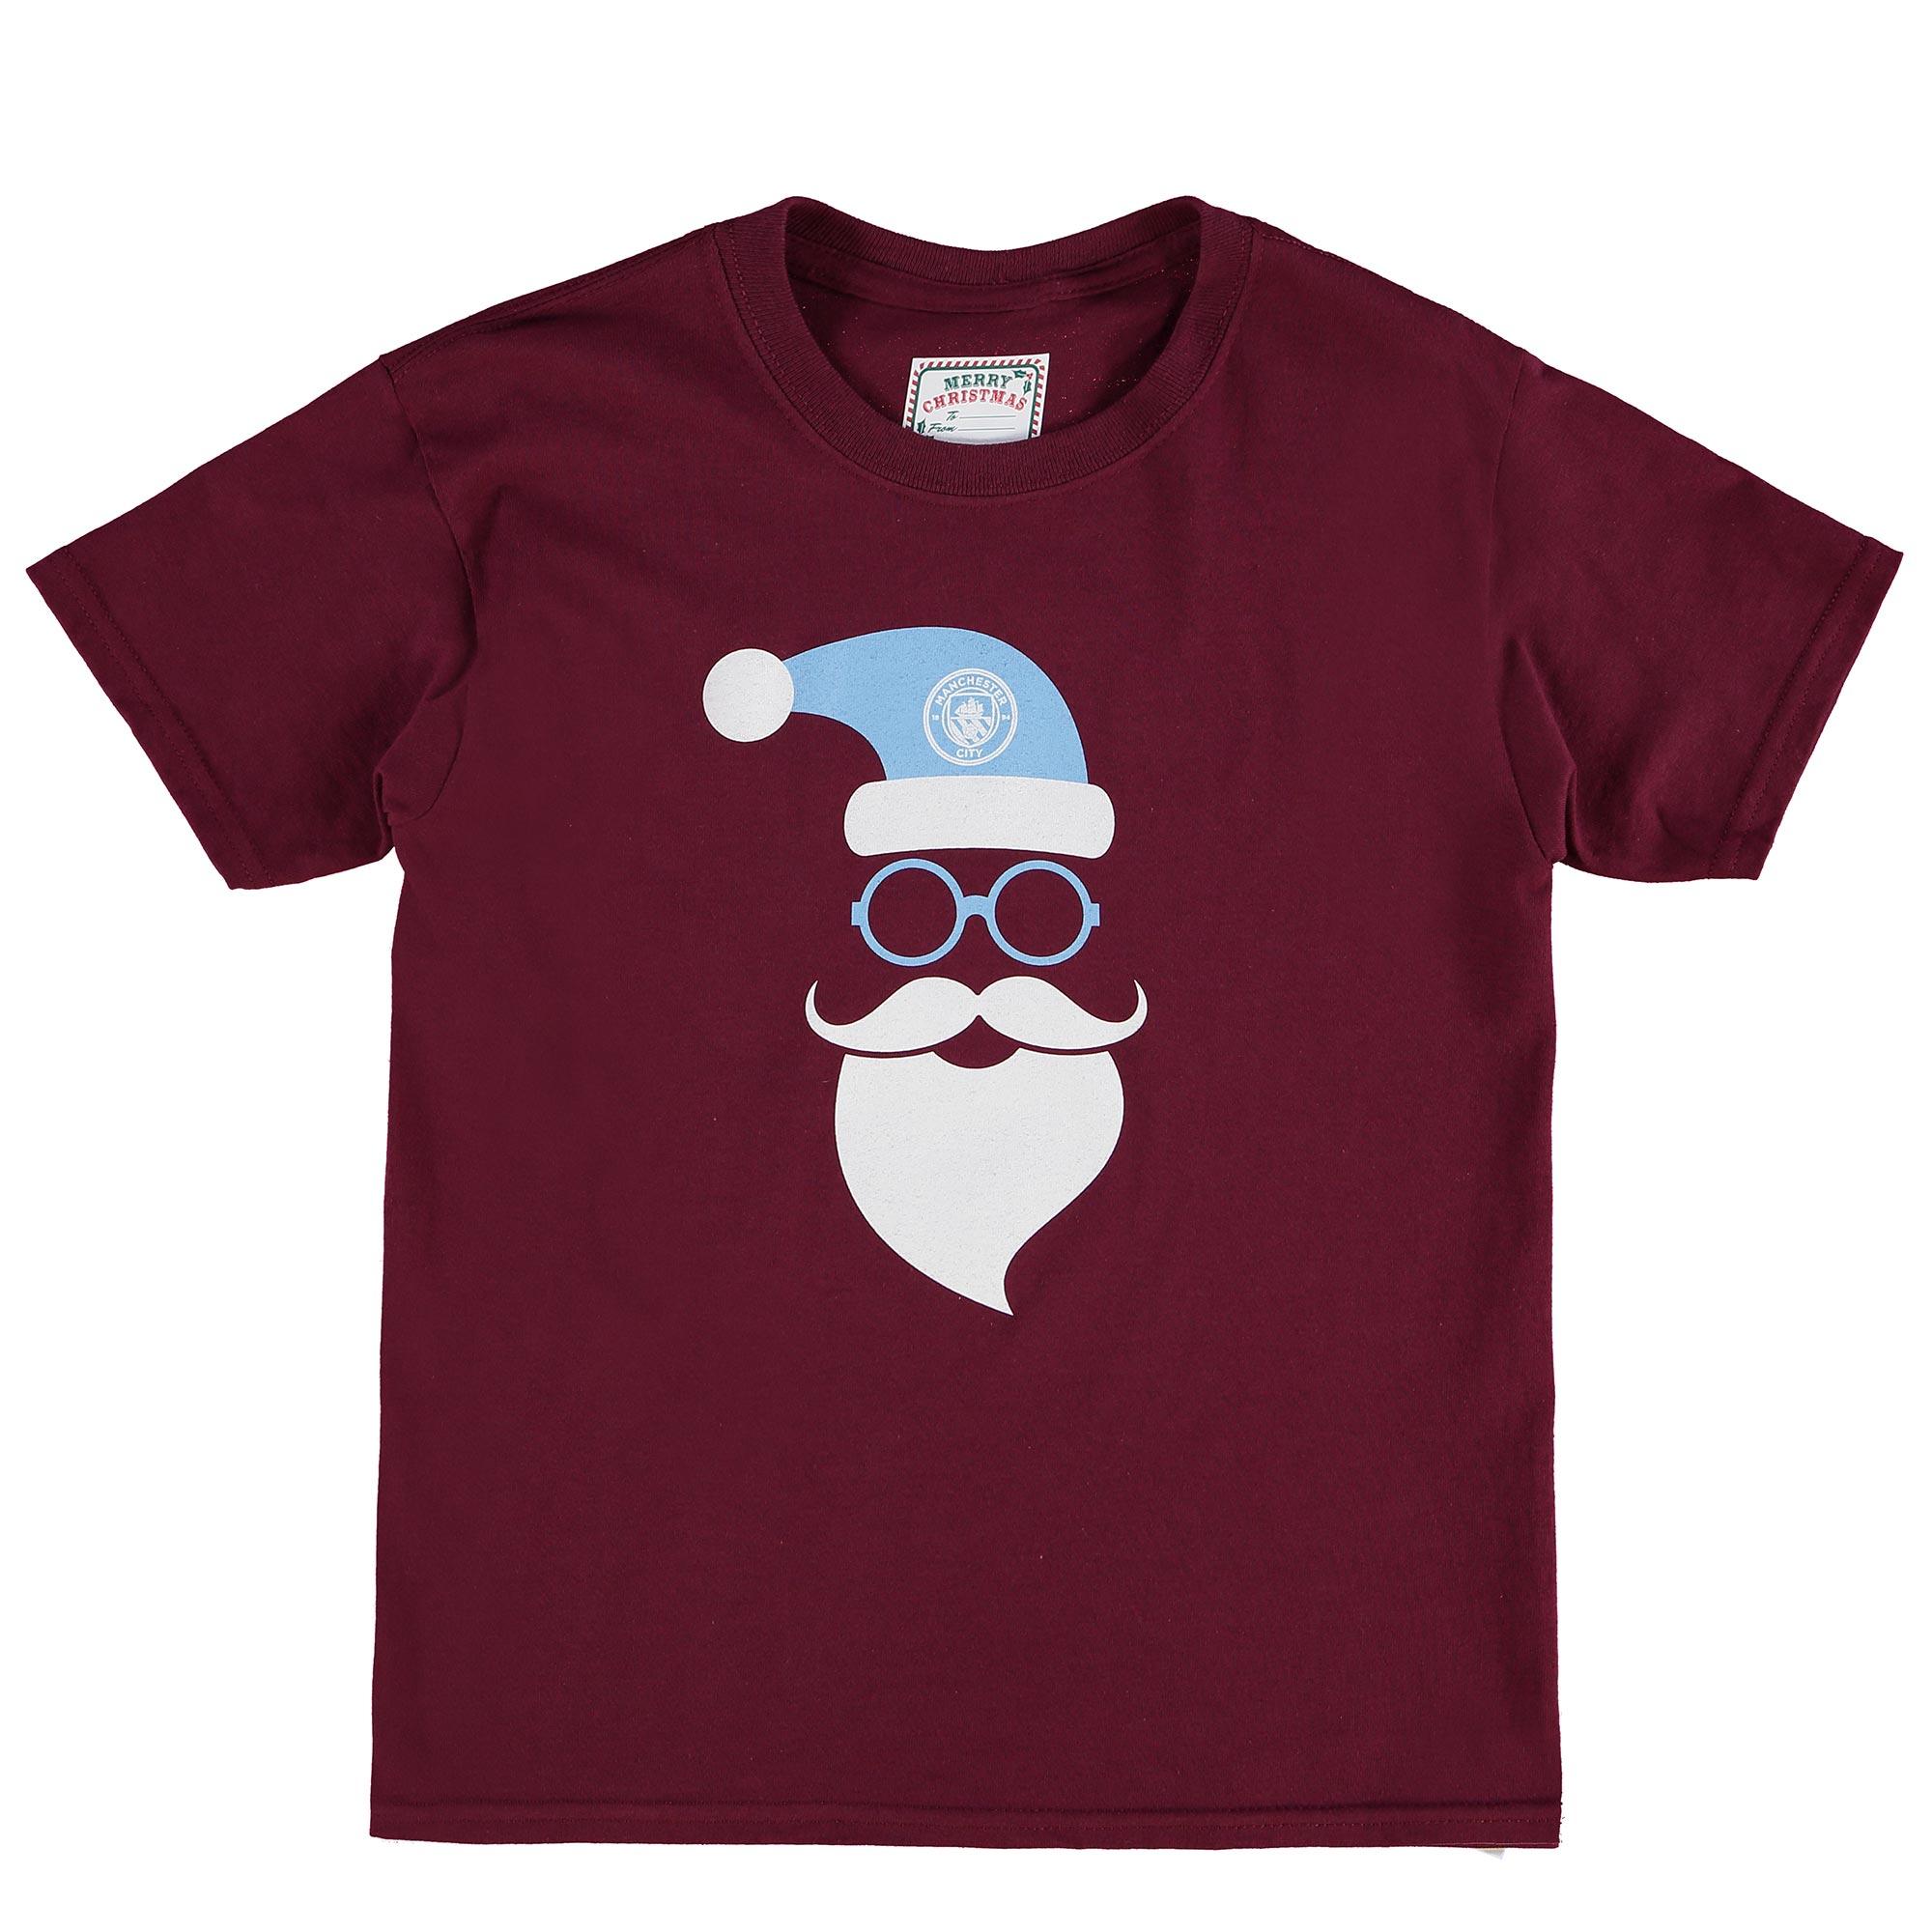 Manchester City Christmas Santa T-Shirt - Maroon - Junior